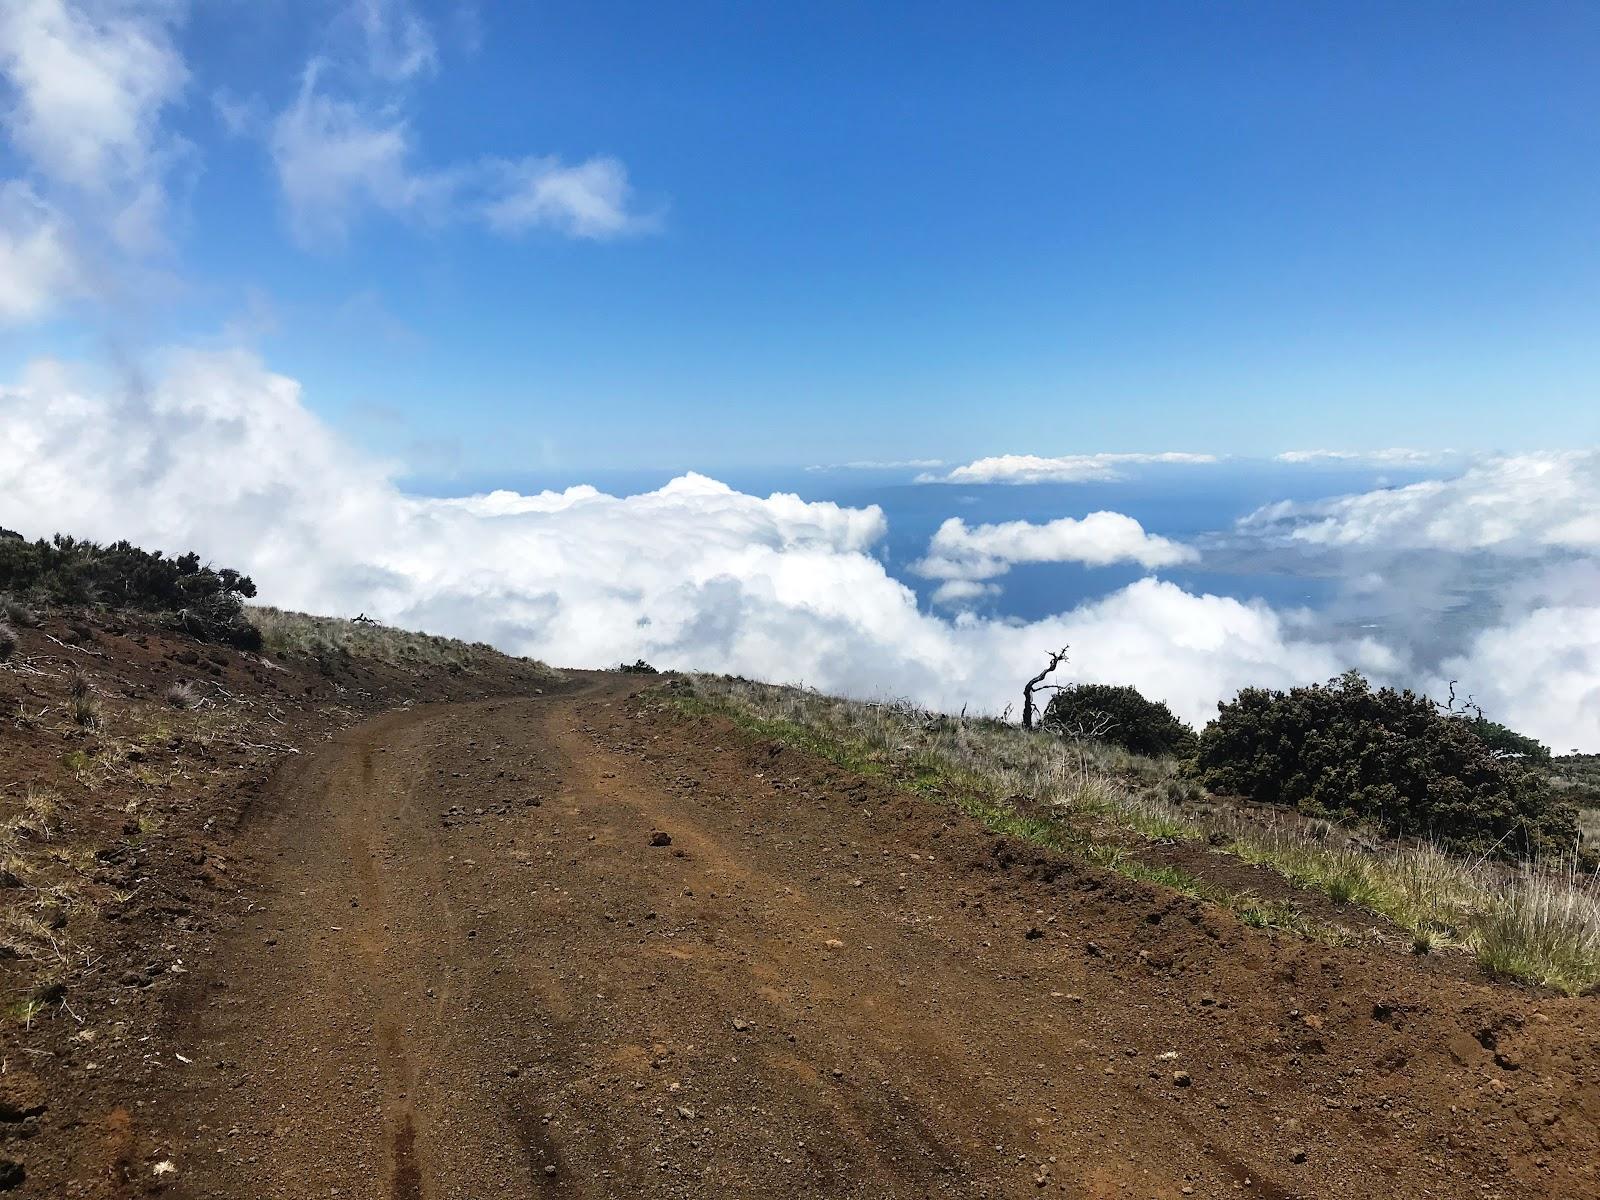 Cycling Skyline Trial to Haleakala